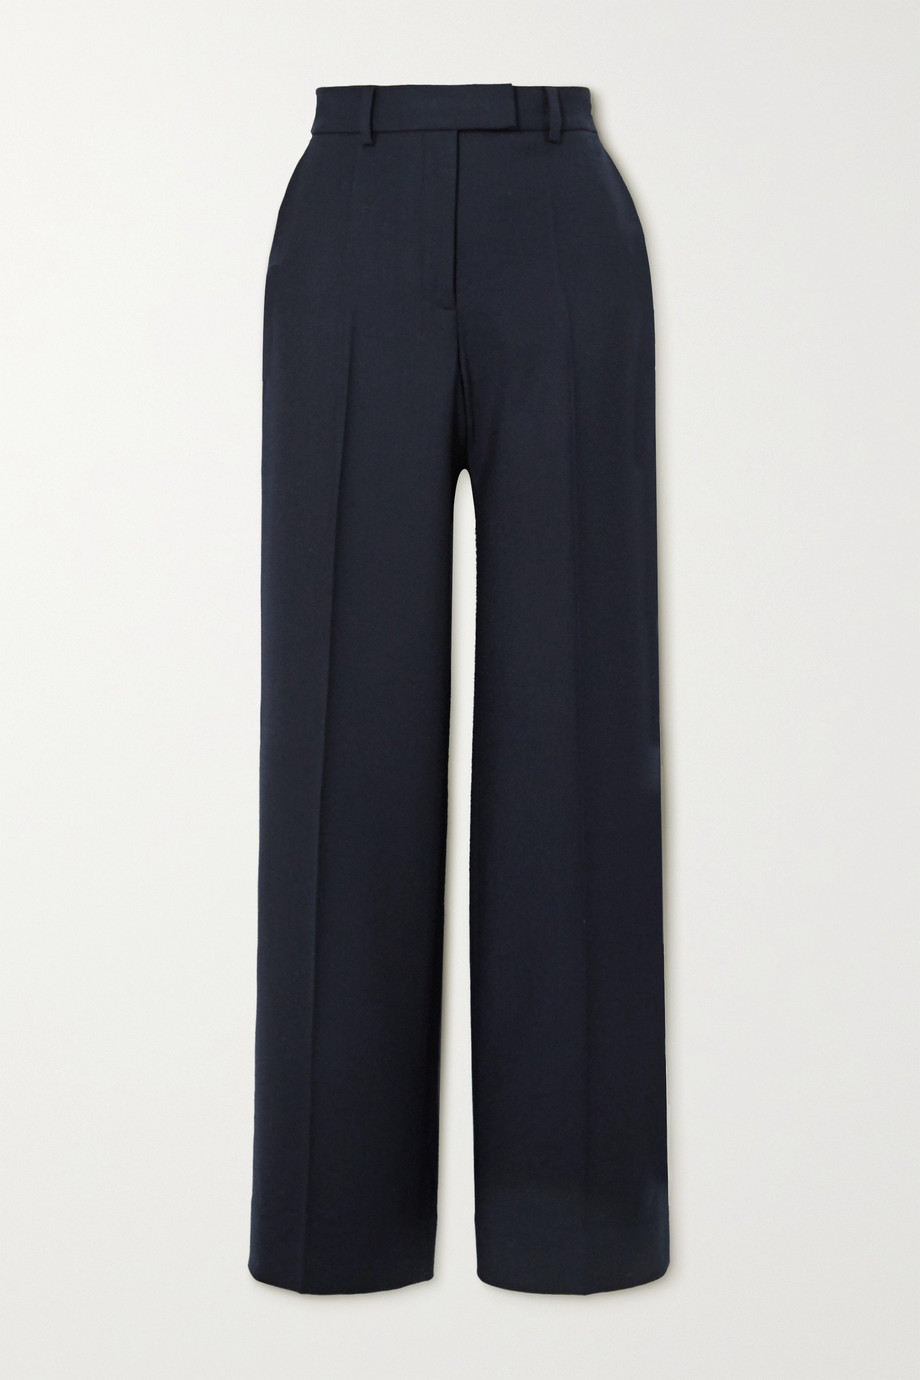 Cefinn Terrence twill straight-leg pants